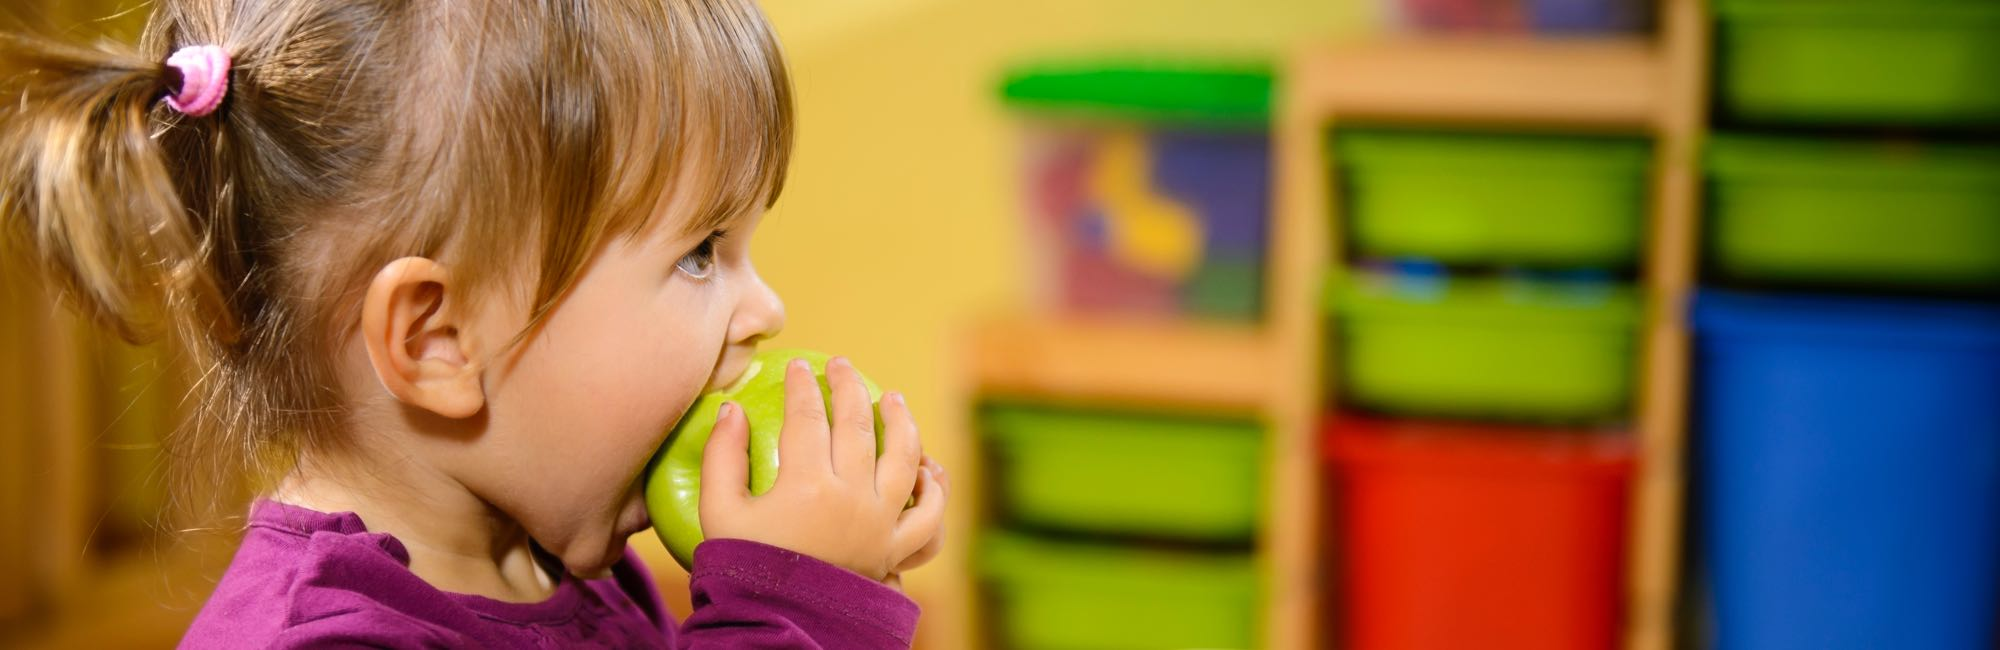 cardapio-infantil-na-escola-adaptado-para-as-necessidades-individuais-1